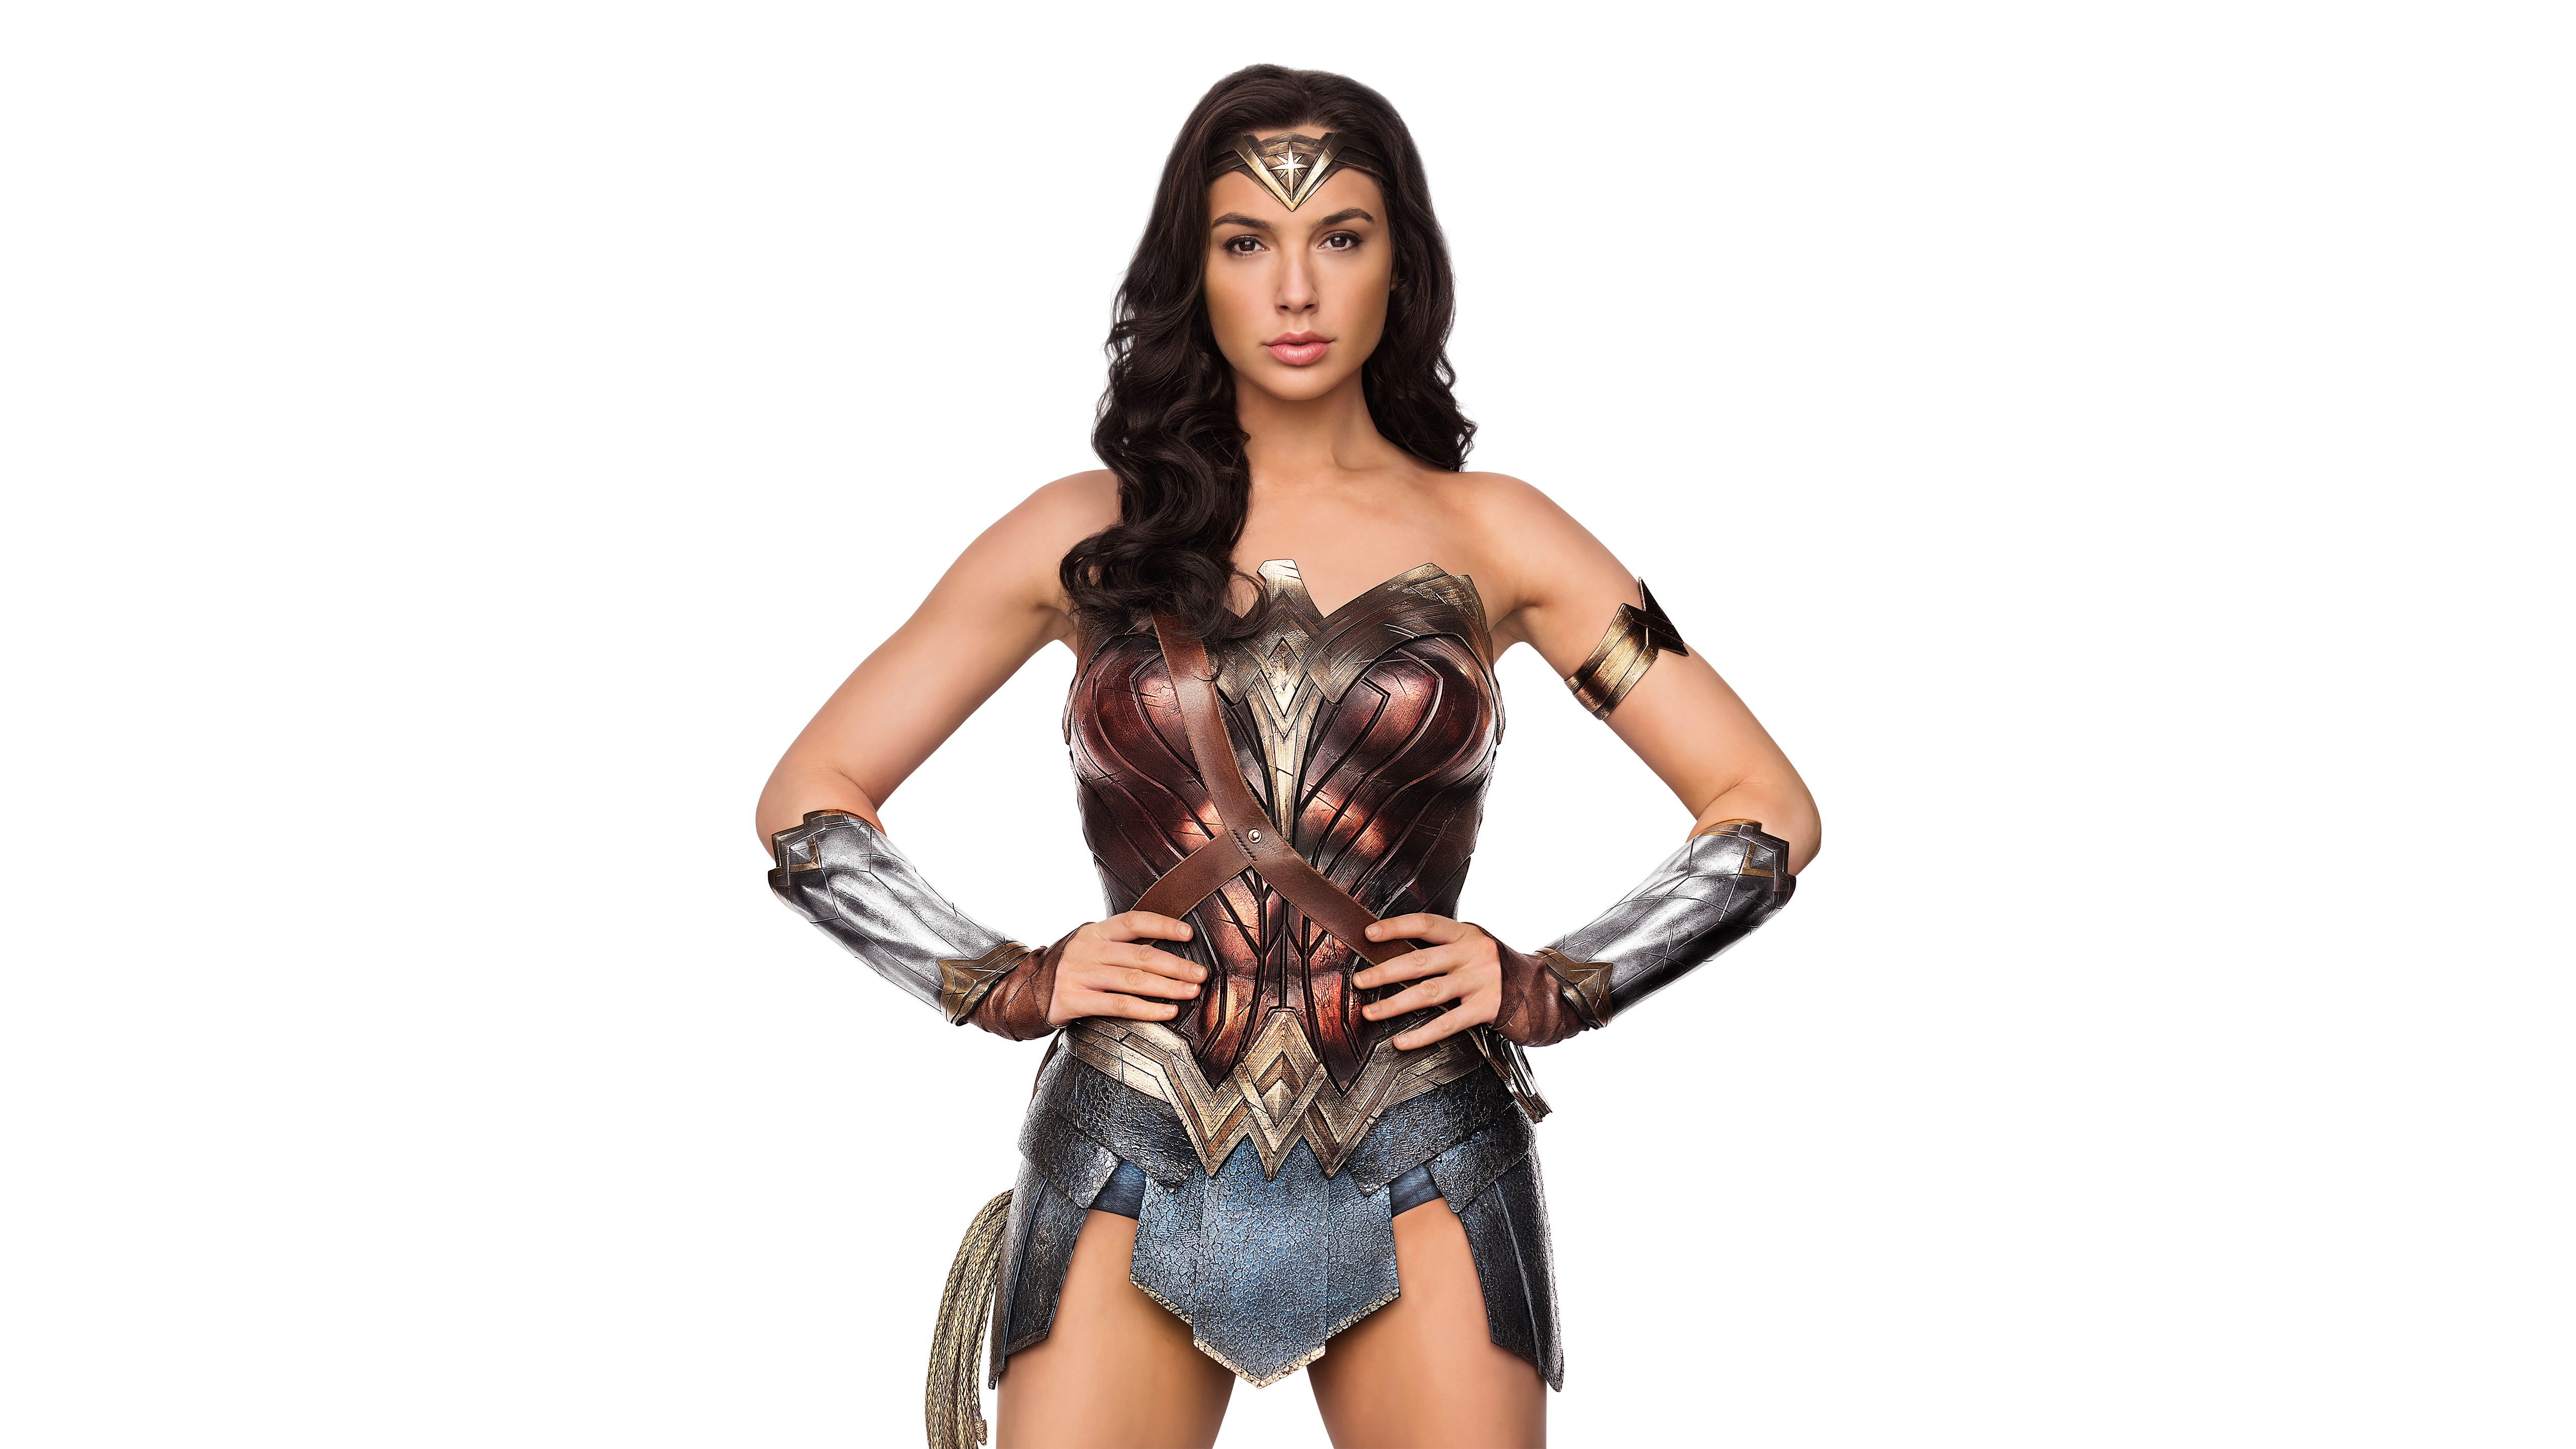 Wallpaper Wonder Woman Gal Gadot Hd 4k 2017 Movies 2361: Gal Gadot Wonder Woman 5k, HD Movies, 4k Wallpapers